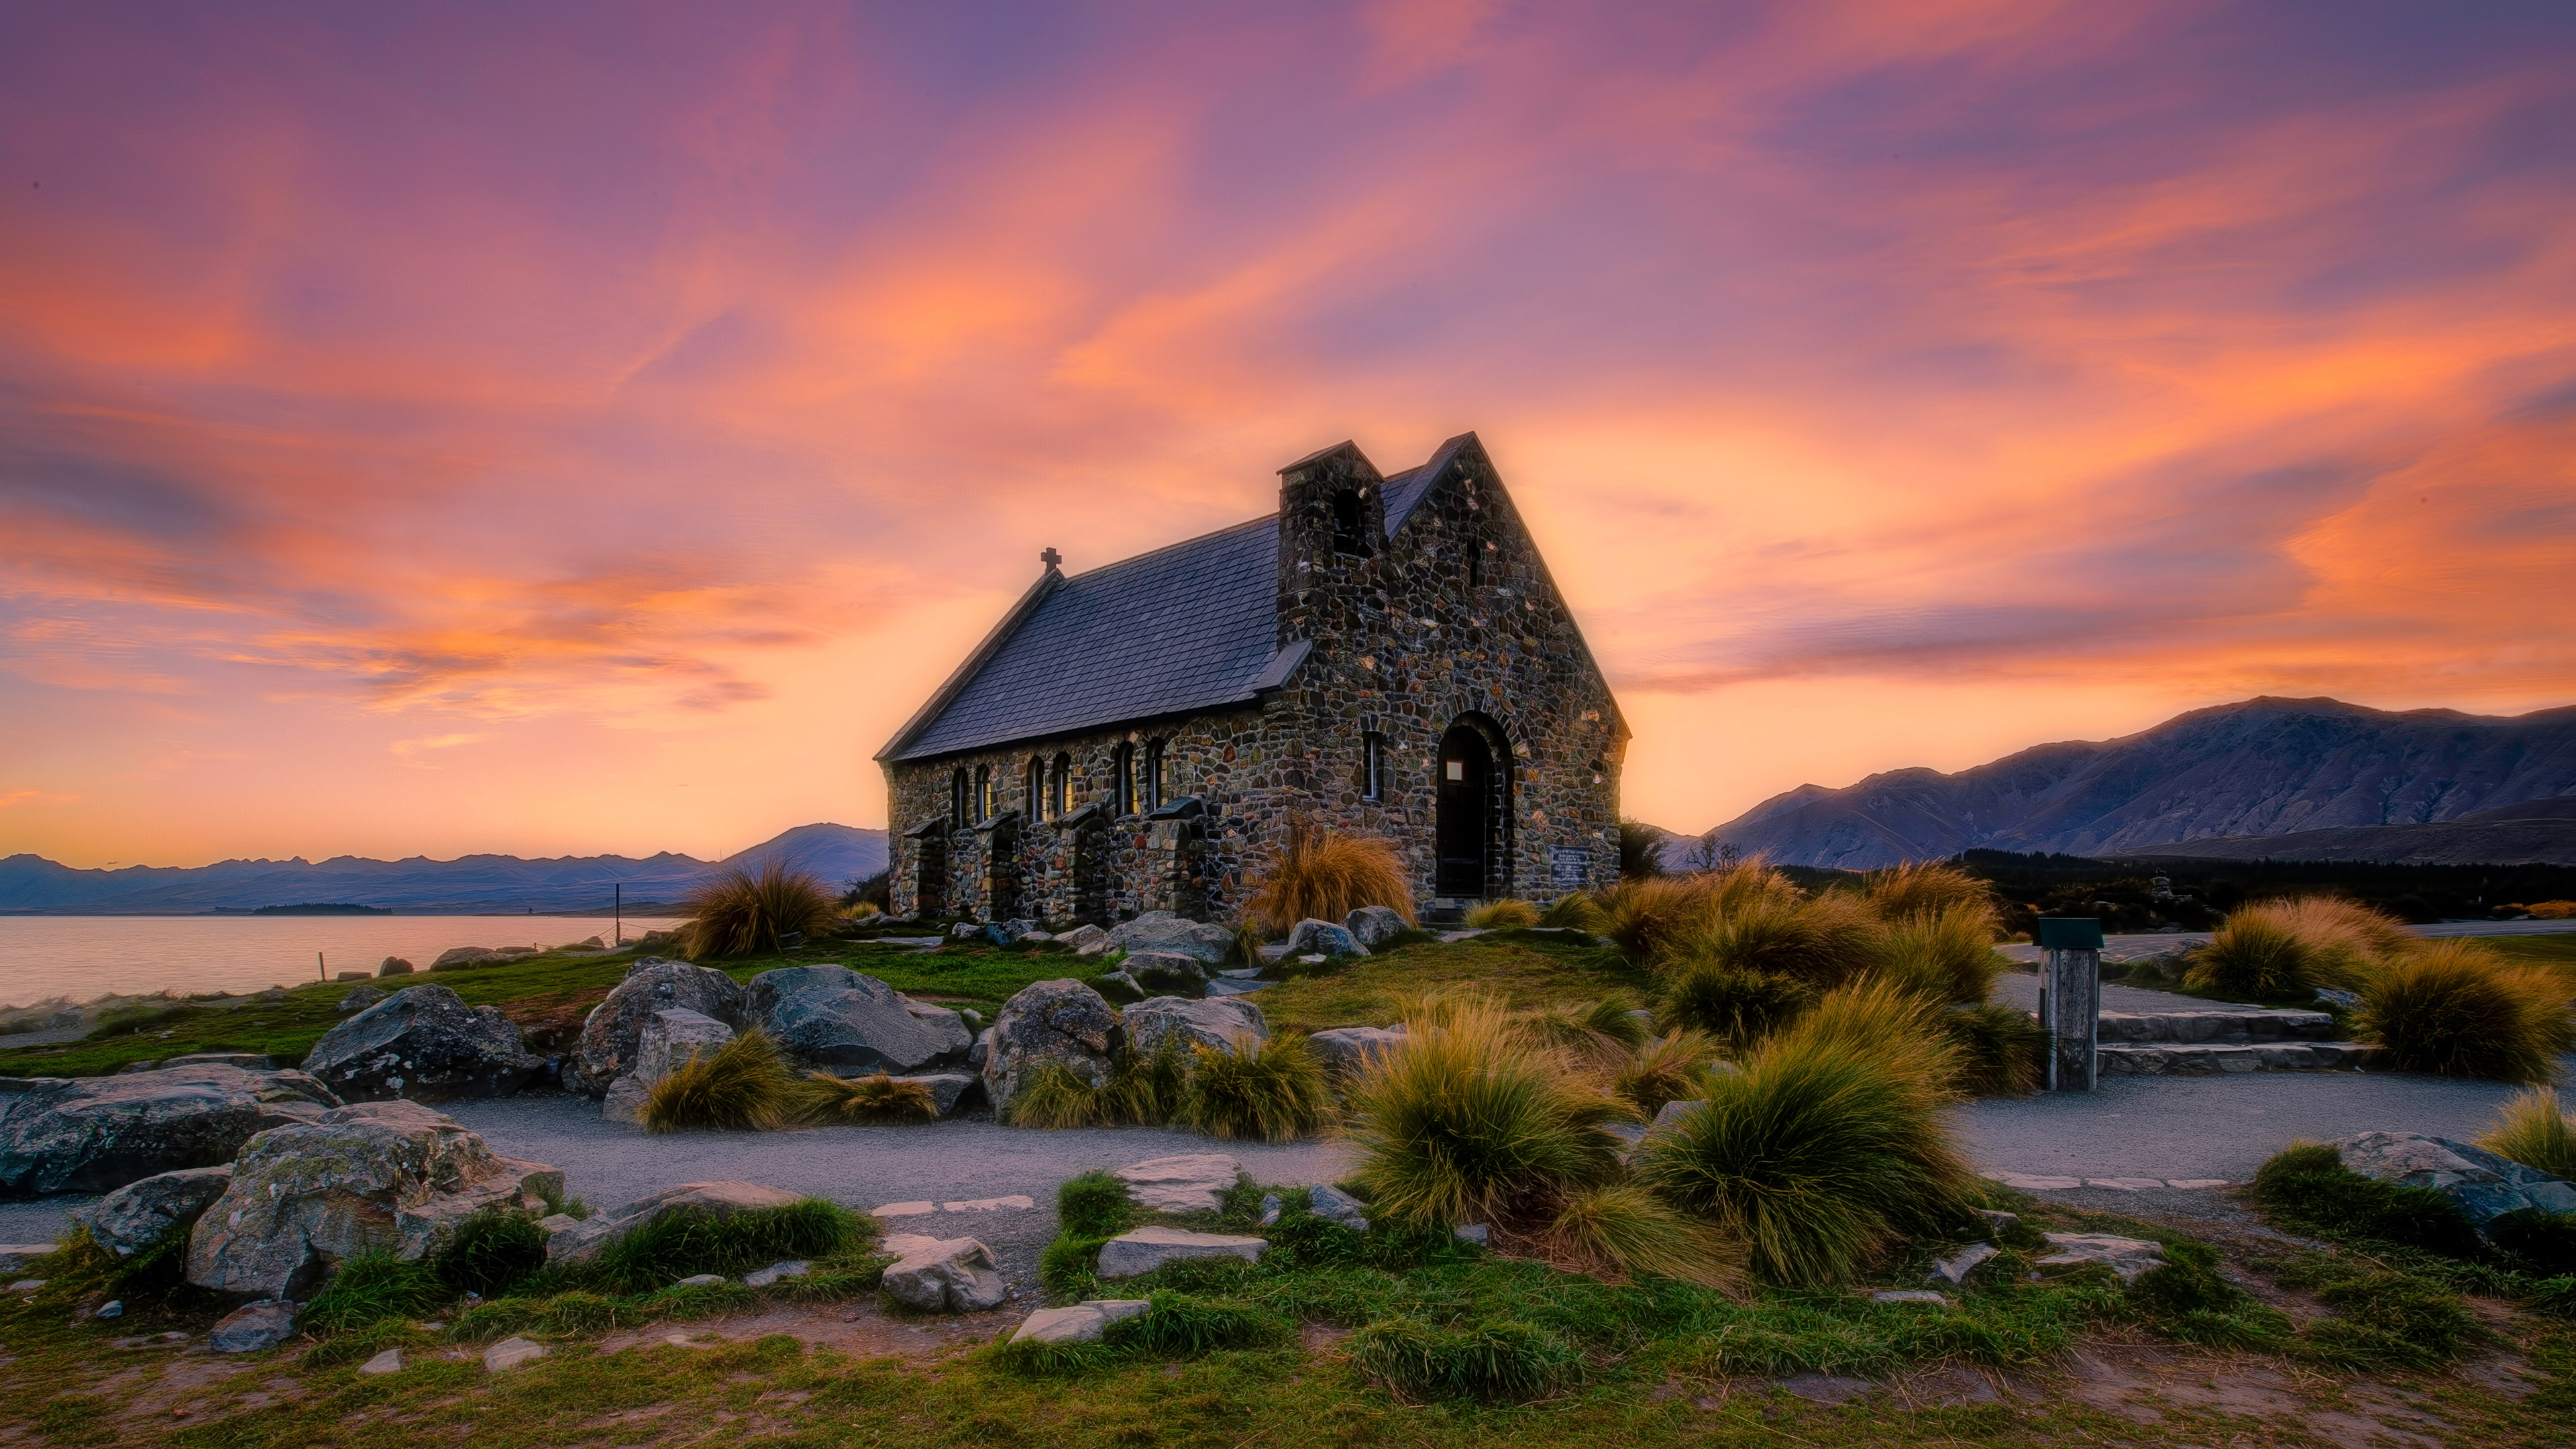 Small Church At Sunset 4k Ultra Fondo De Pantalla Hd Fondo